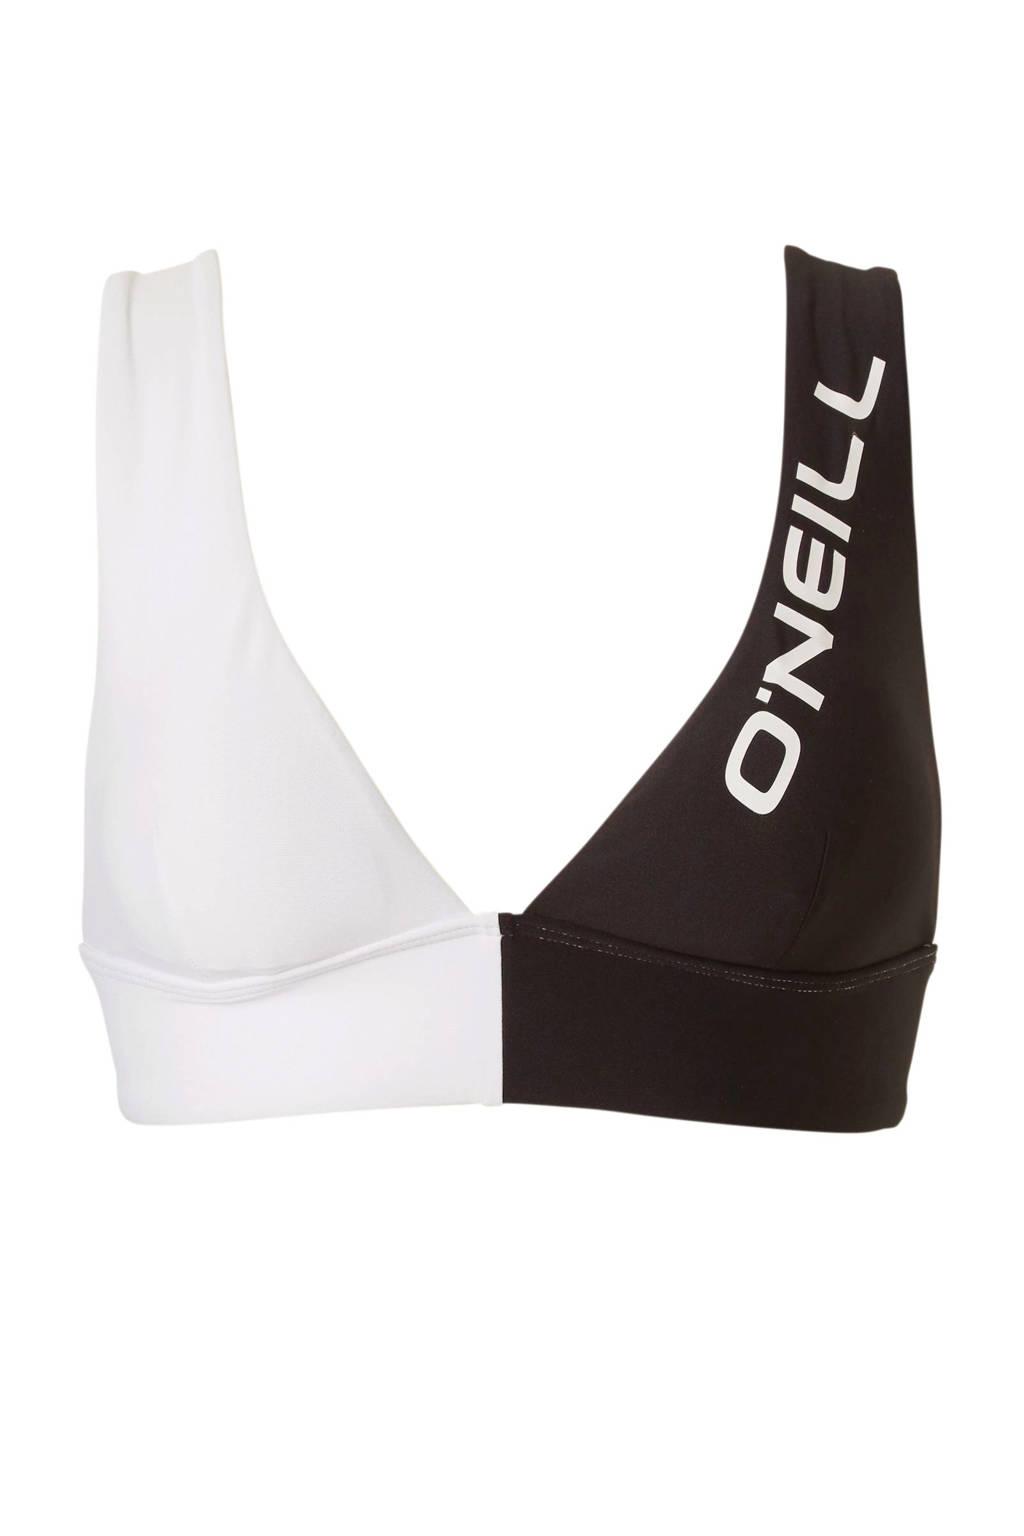 O'Neill bikinitop Hyperdry wit/zwart, Wit/zwart